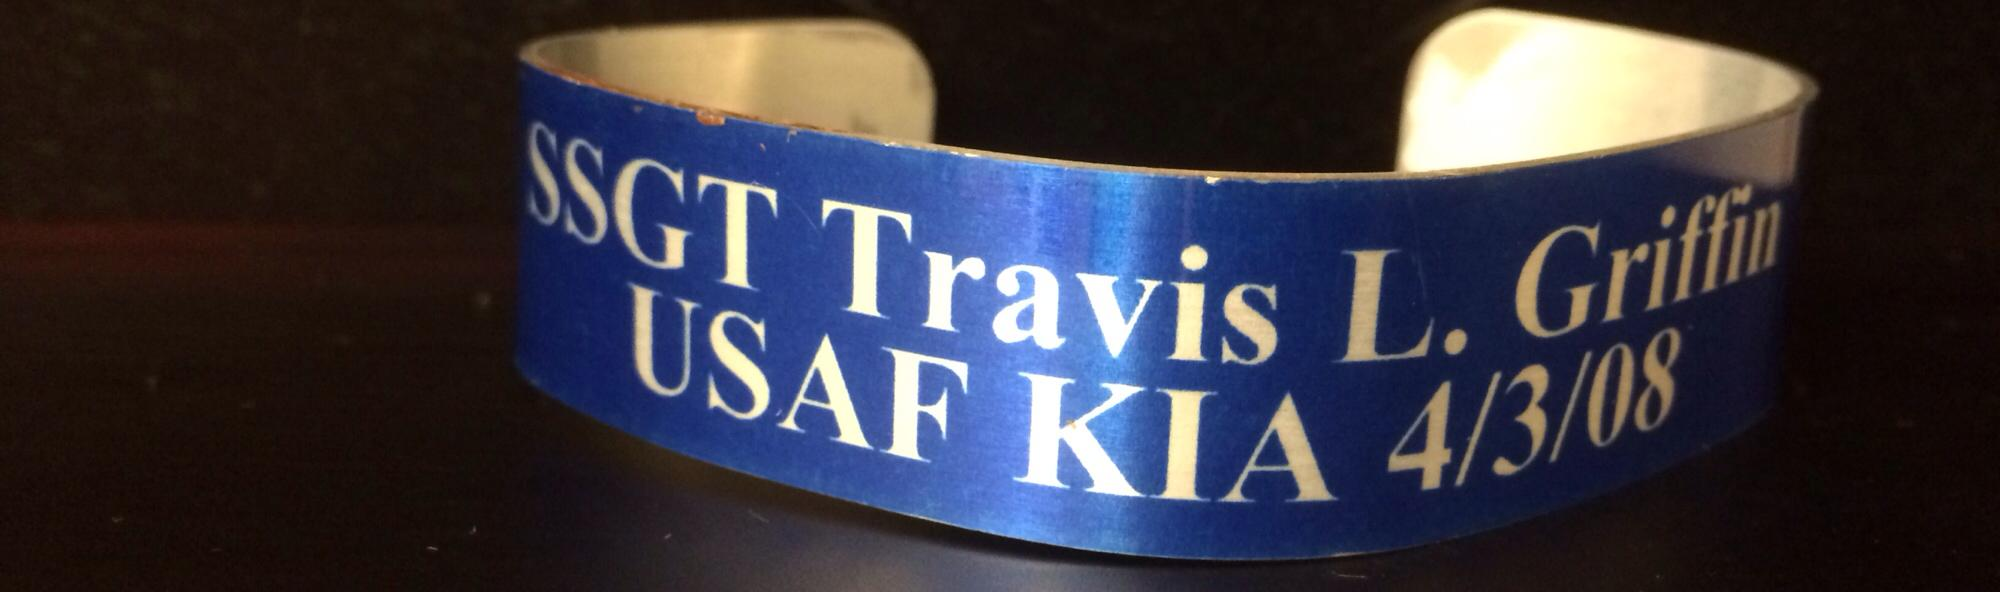 Griff's Memorial Bracelet